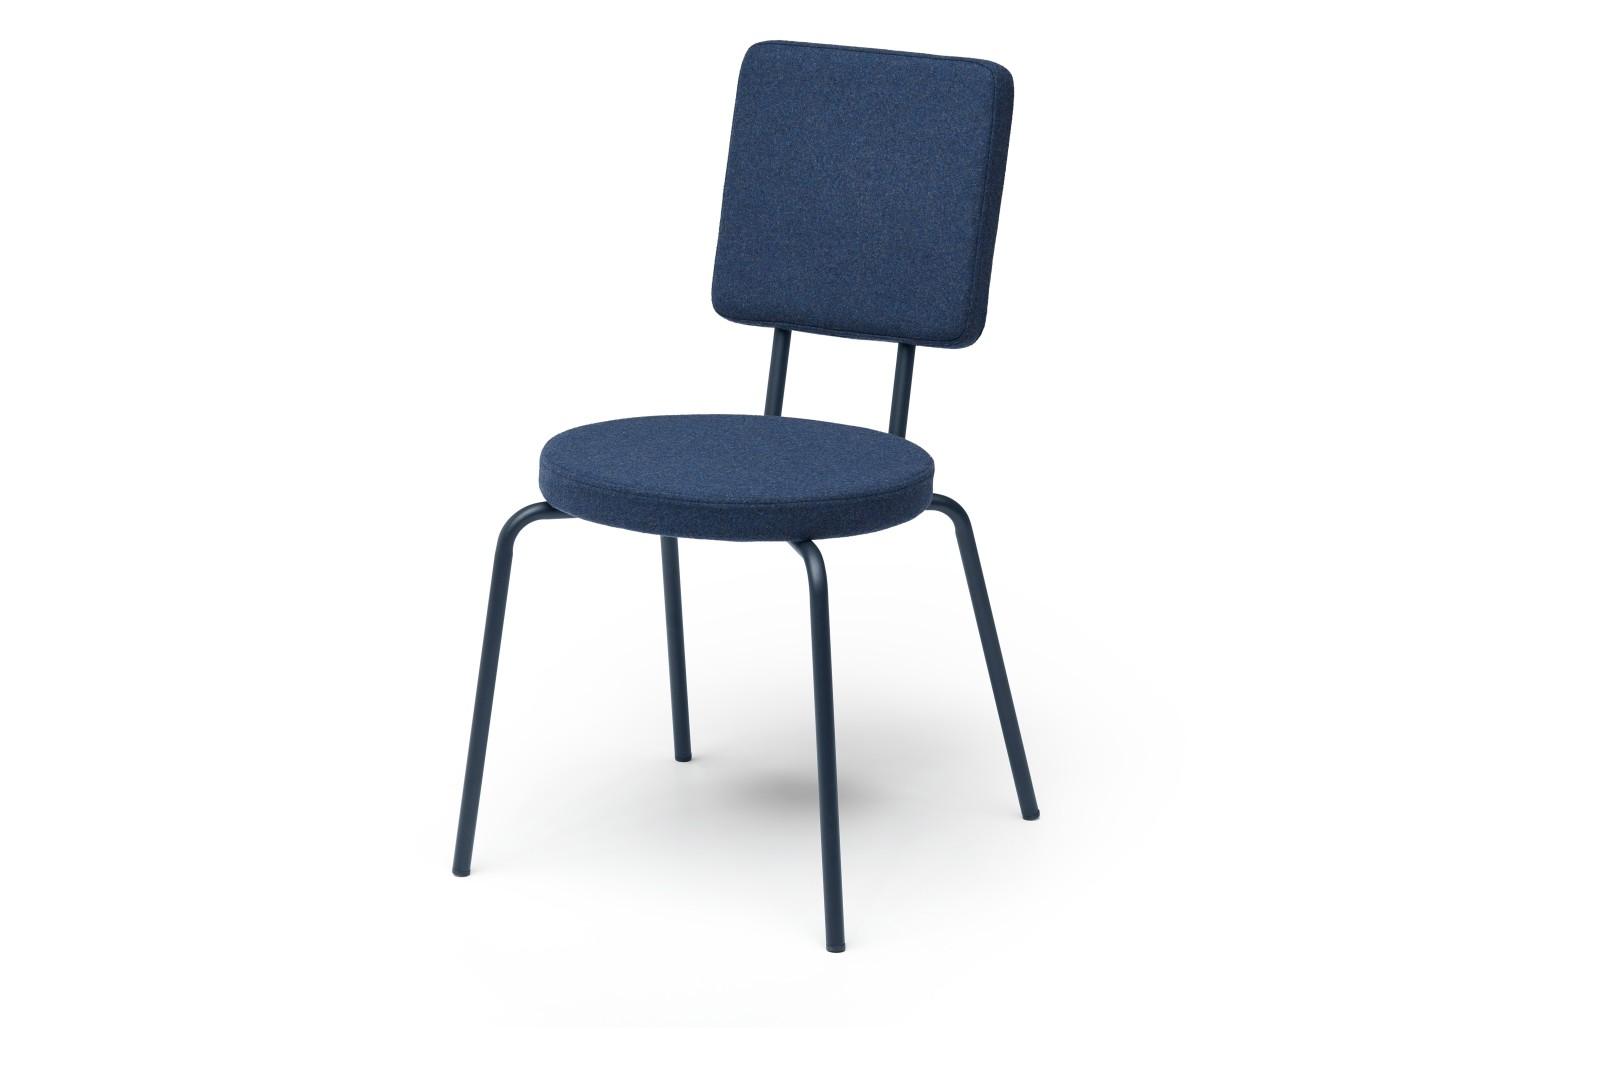 Option Dining Chair Round Seat Square Backrest Dark Blue